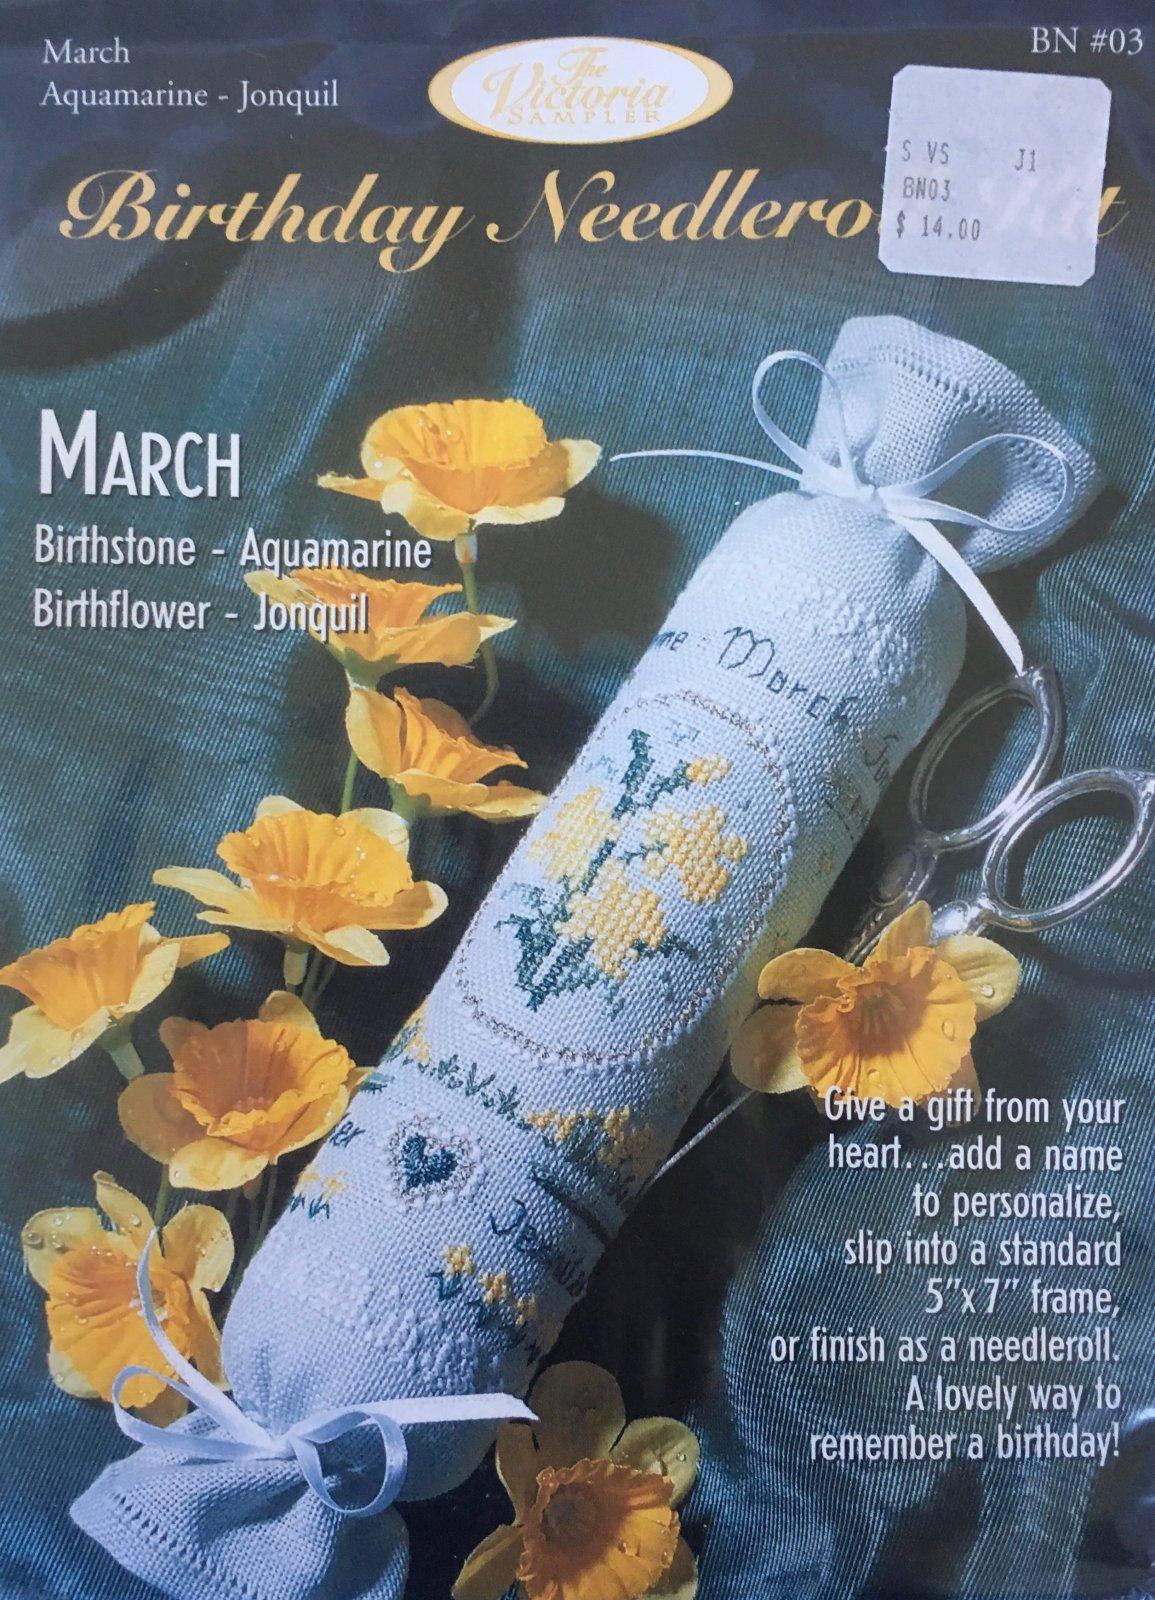 The Victoria Sampler: Birthday Needleroll Kit March BN #03